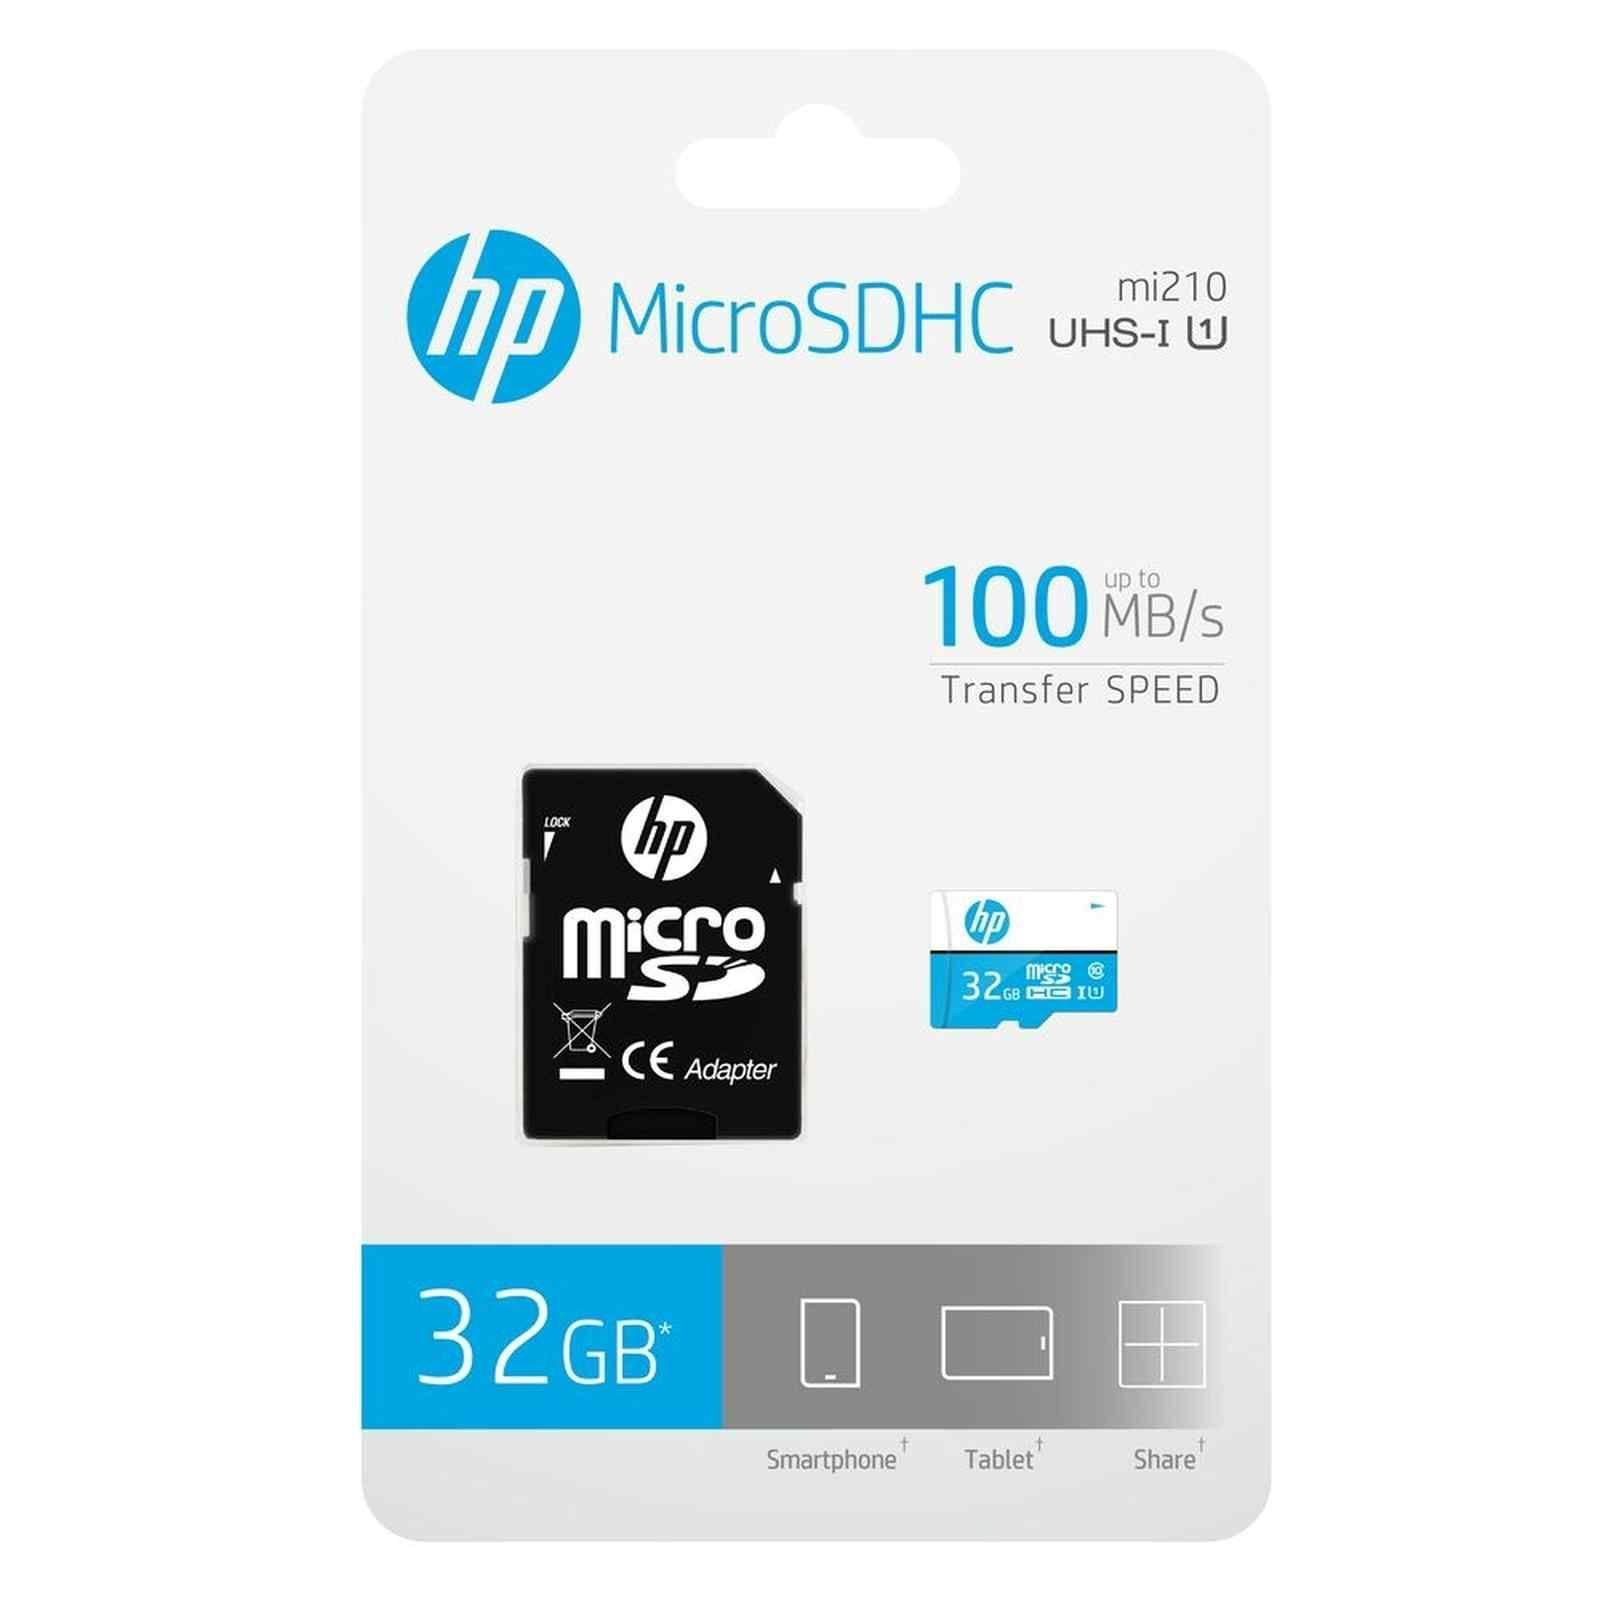 CARTAO DE MEMORIA CLASS10 MICRO SDHC 32 GB C/ADAPTADOR HFUD032-1U1BA HP@